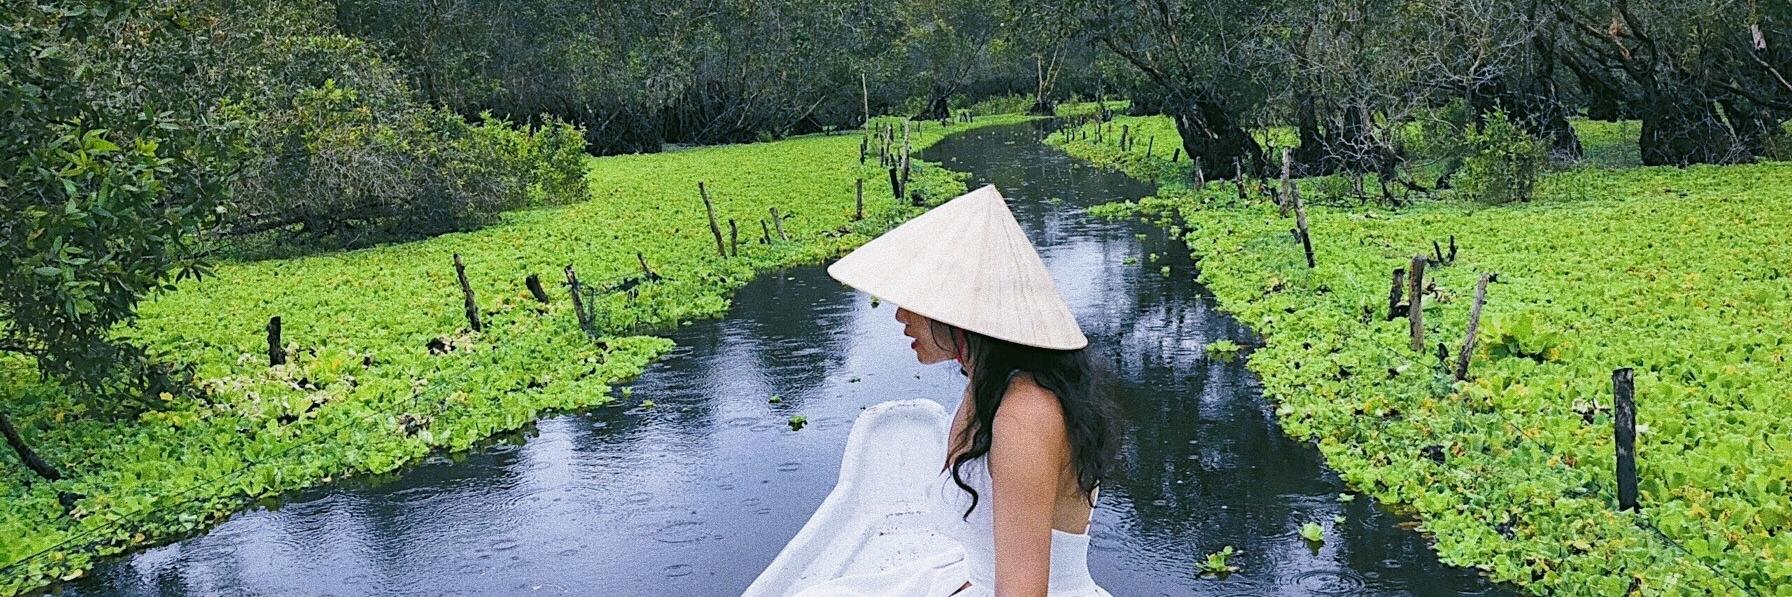 https://gody.vn/blog/nhu.bach7672/post/du-lich-mien-tay-dip-tet-nguyen-dan-di-mai-chang-chan-cho-choi-2647